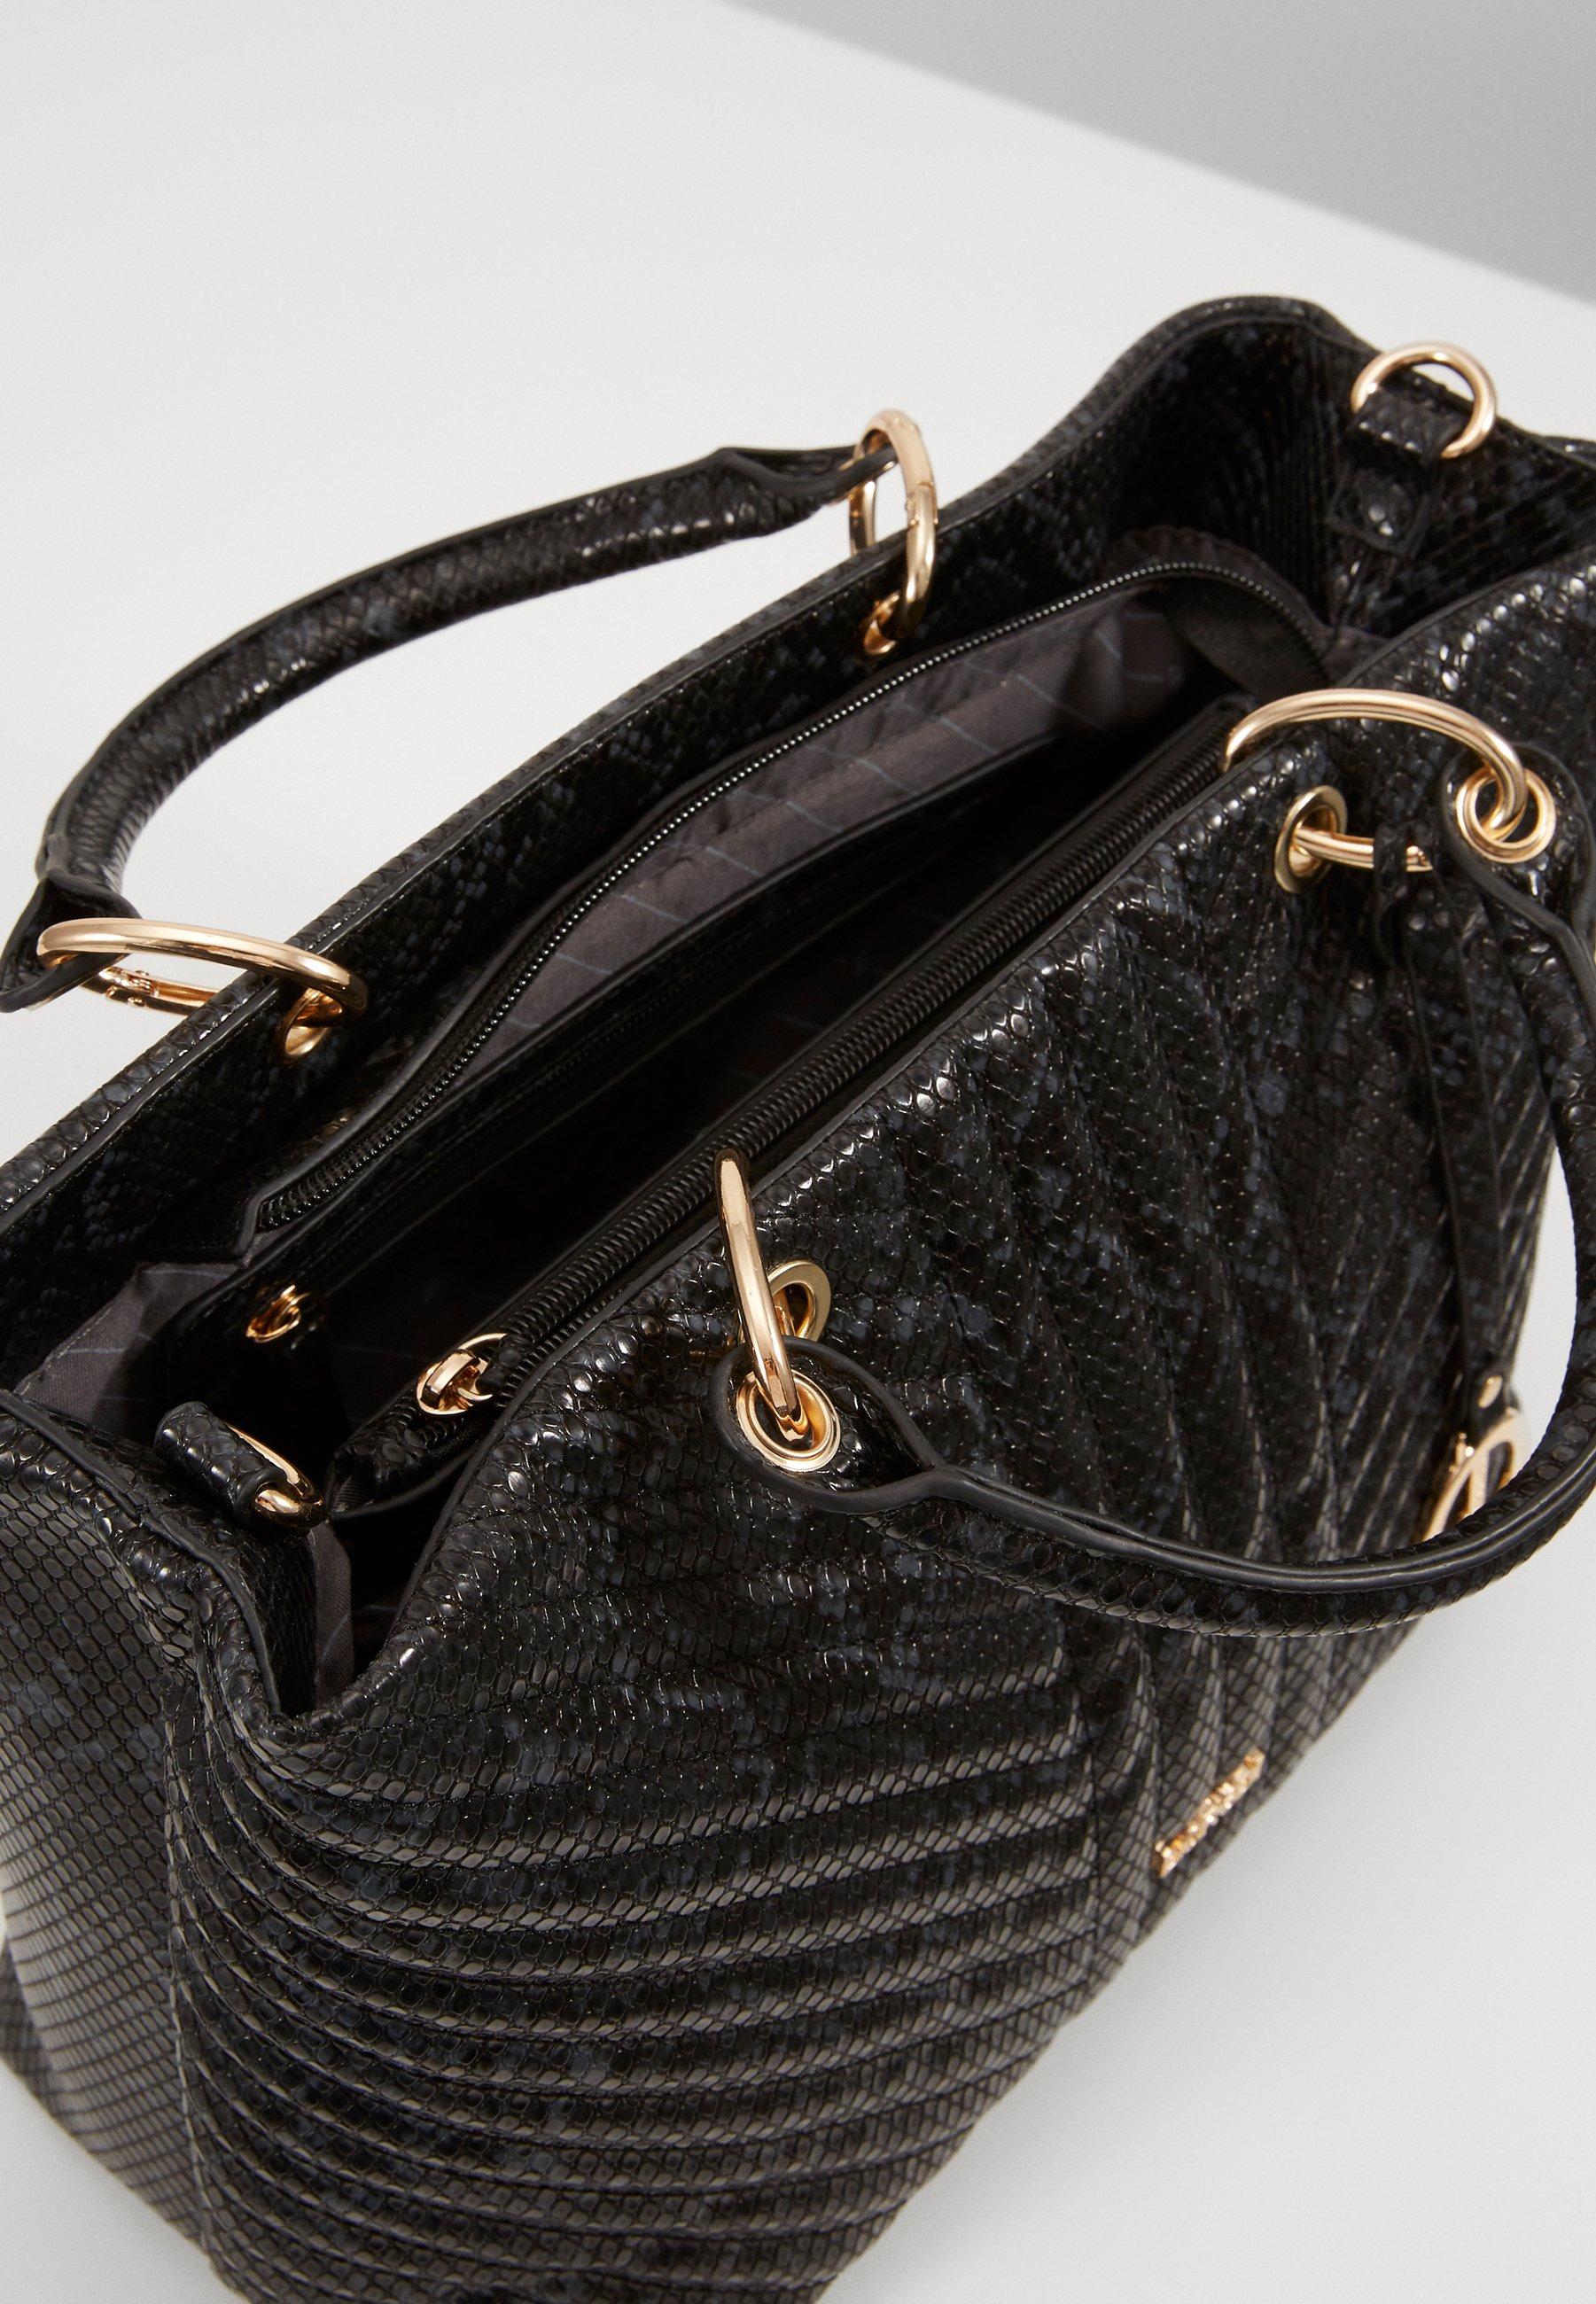 New 2020 Newest Accessories L.Credi FATIMA Handbag schwarz qRLty4csG Kj9H0InYv